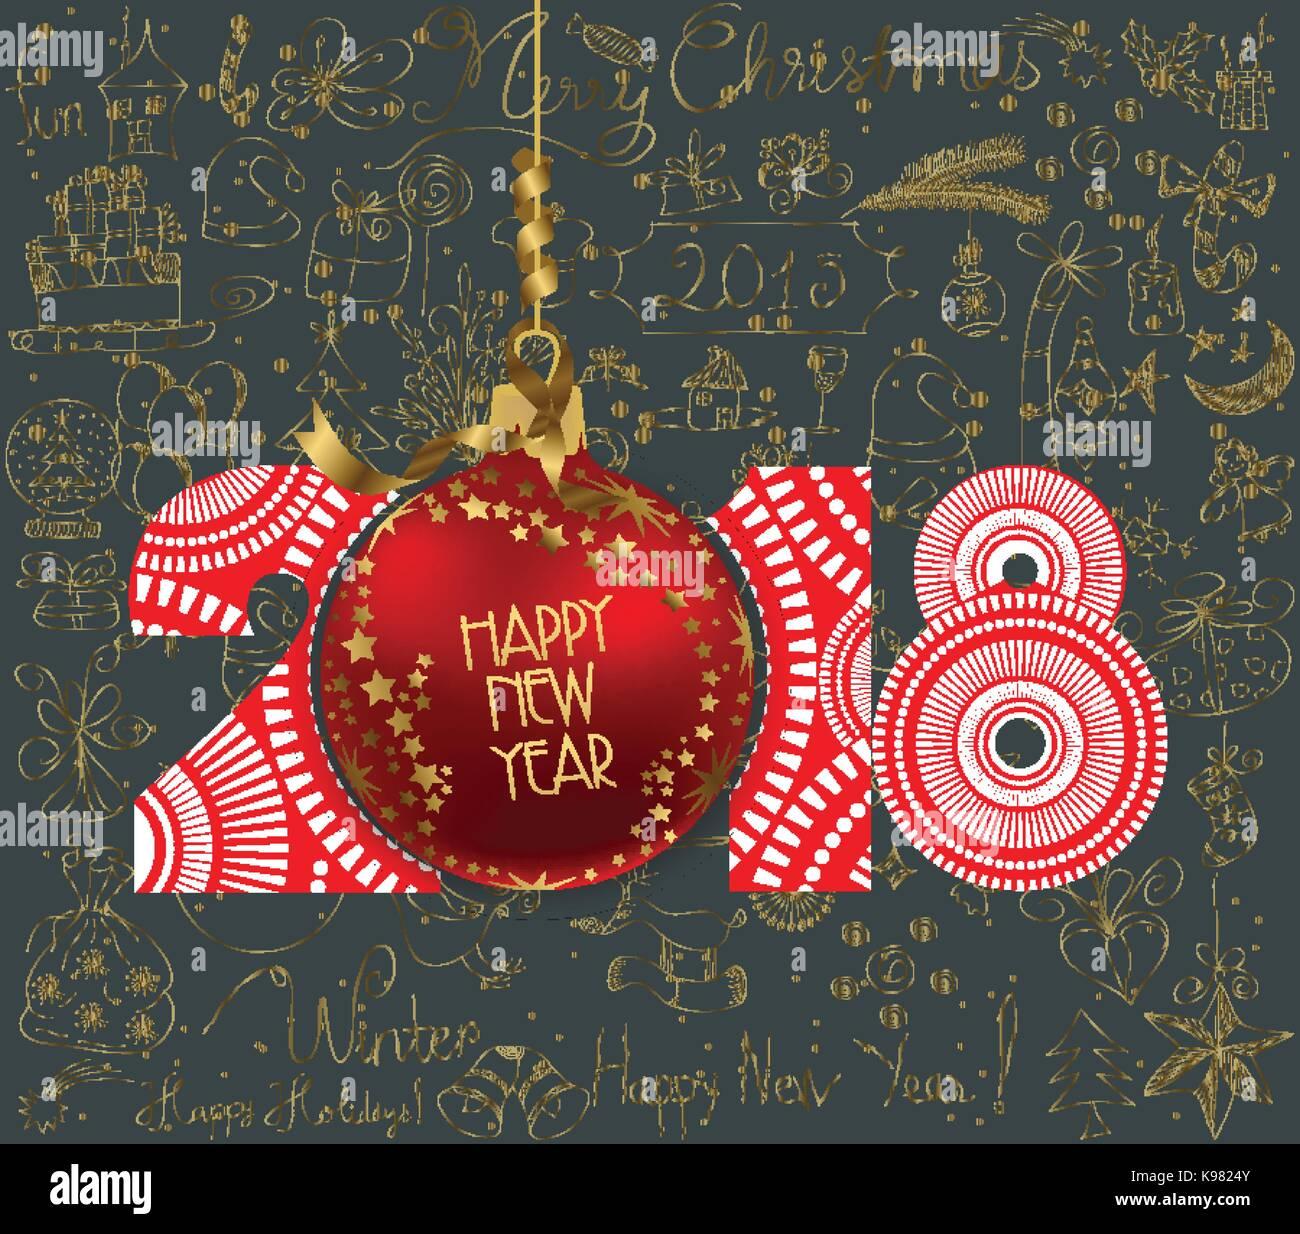 Happy New Year Elegant Images 34